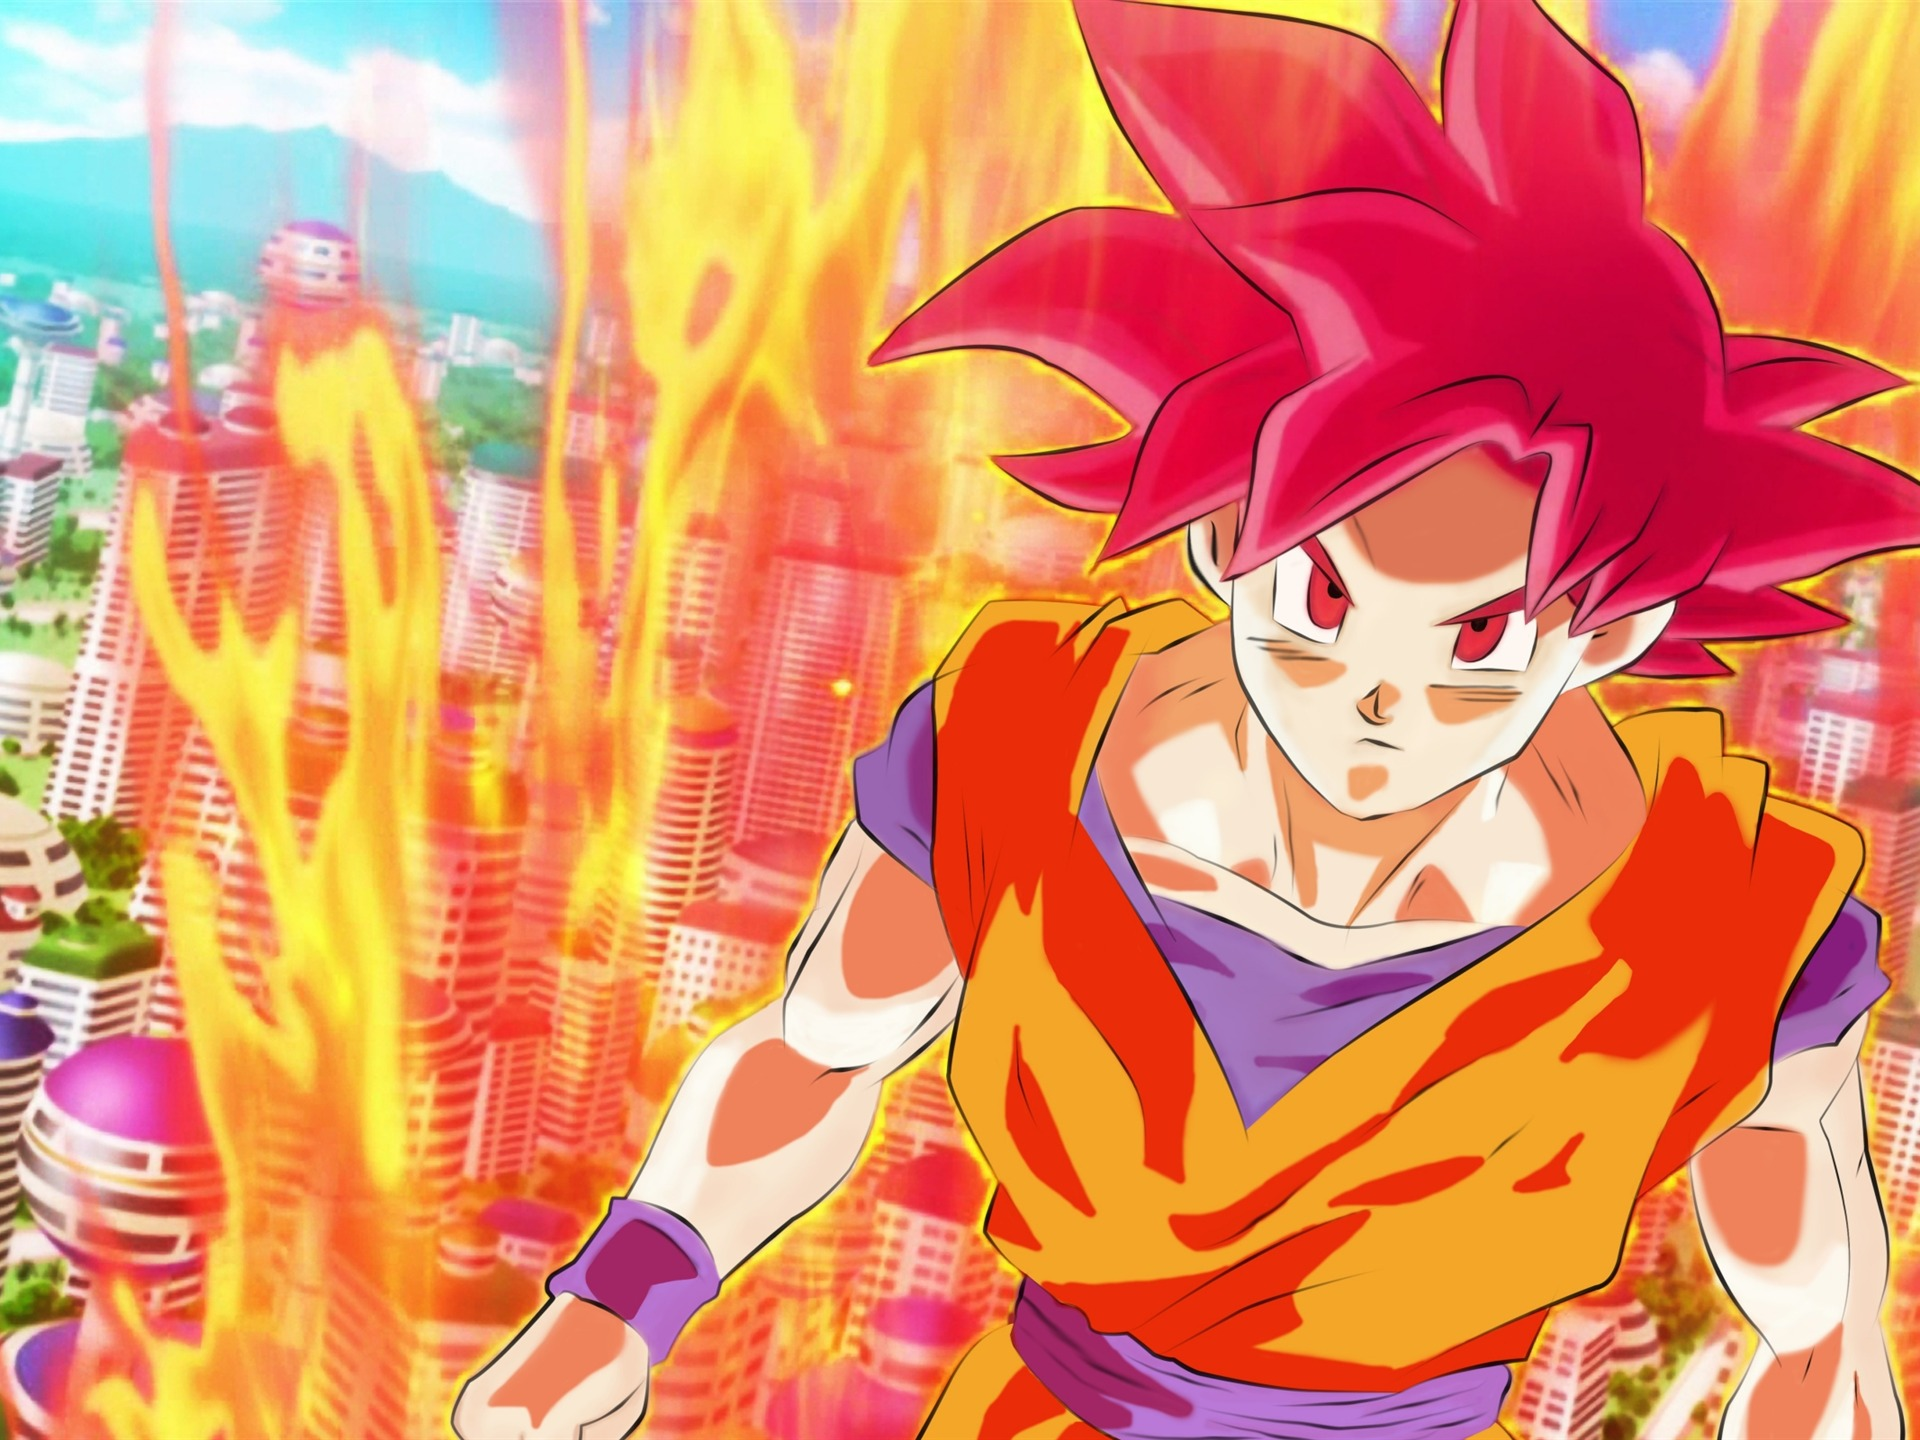 Dragon Ball Super Anime Design Hd Wallpaper 02 Avance